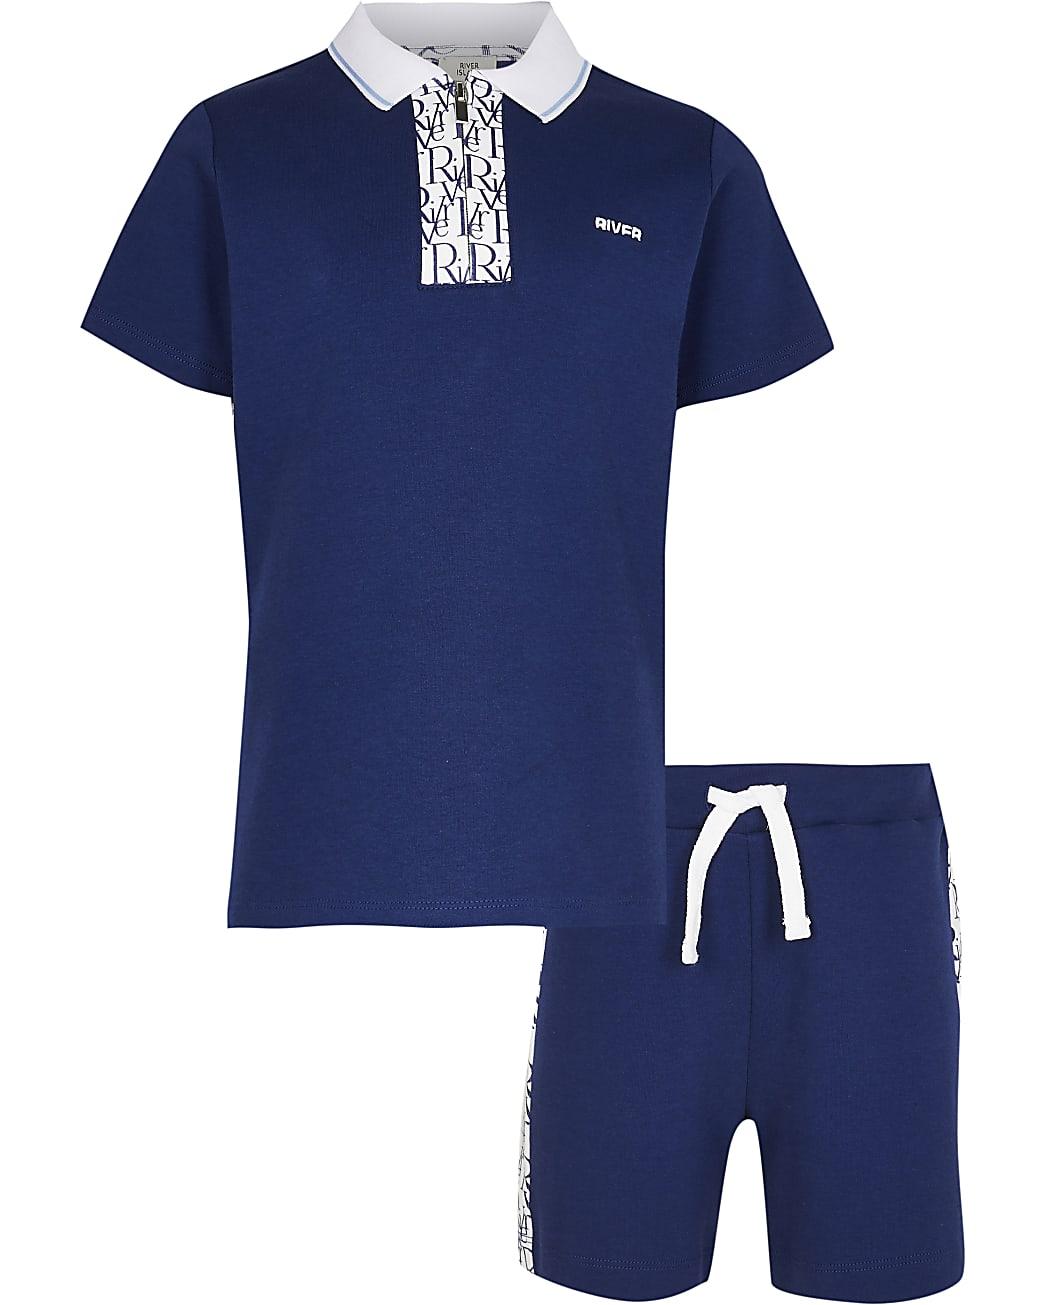 Boys blue RI monogram polo shirt outfit